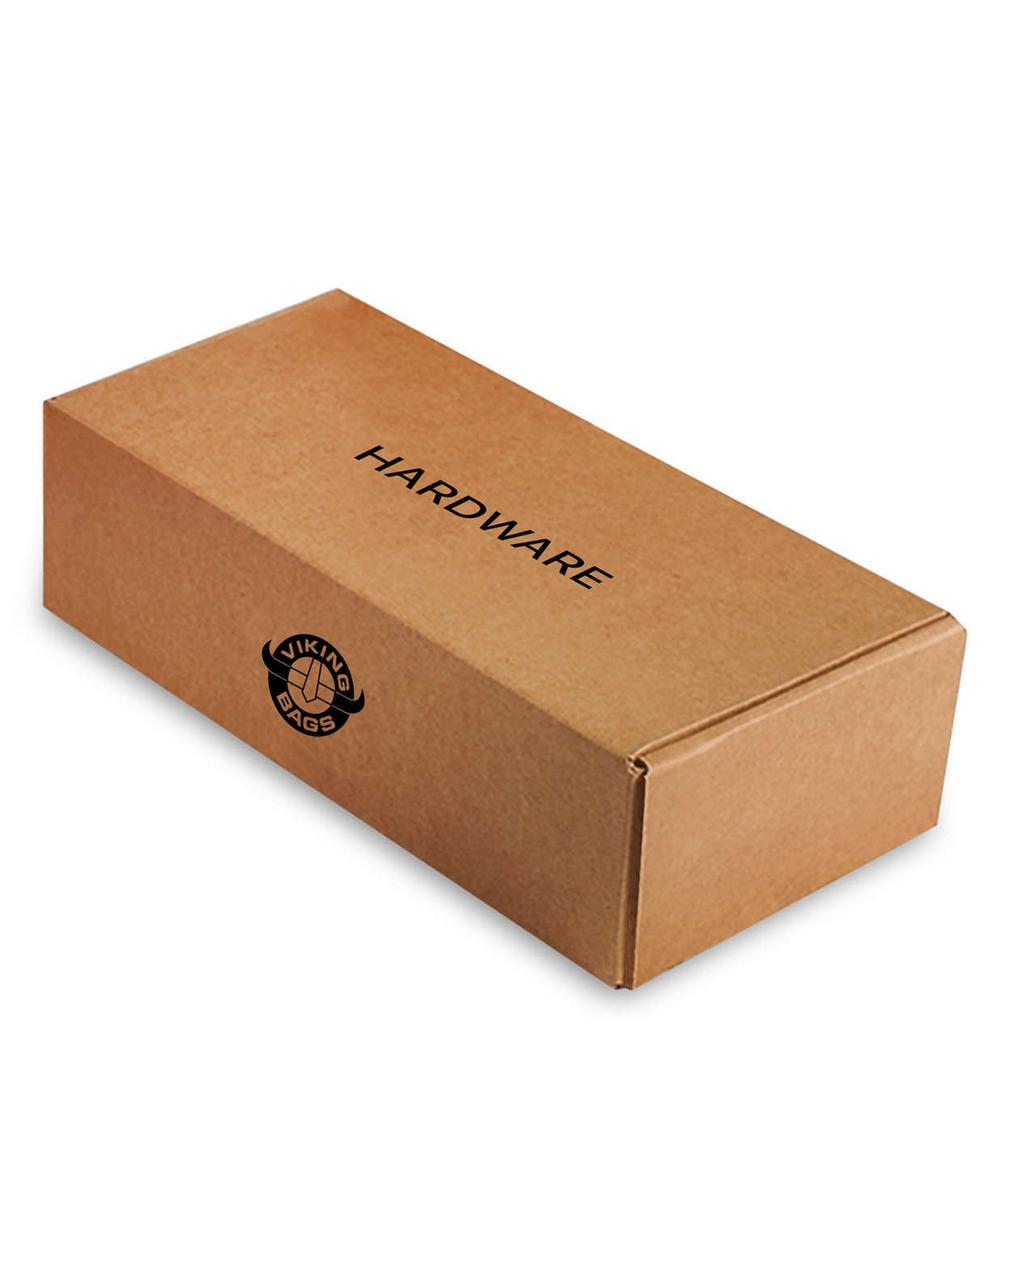 Honda VTX 1800 C Side Pocket Motorcycle Saddlebags Box